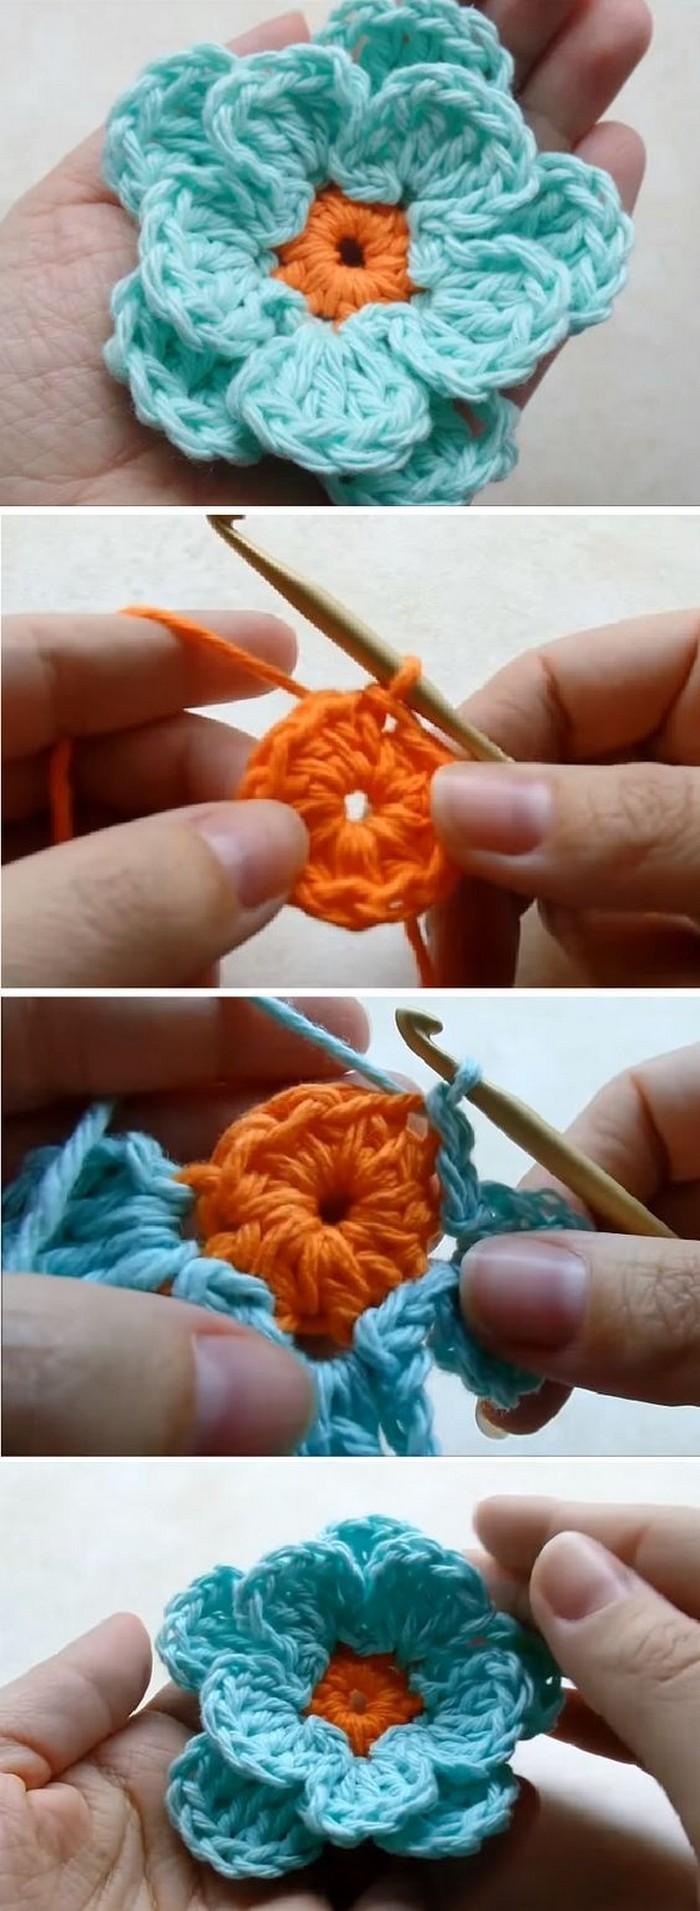 Easy To Make Crochet Flower Free Crochet Pattern